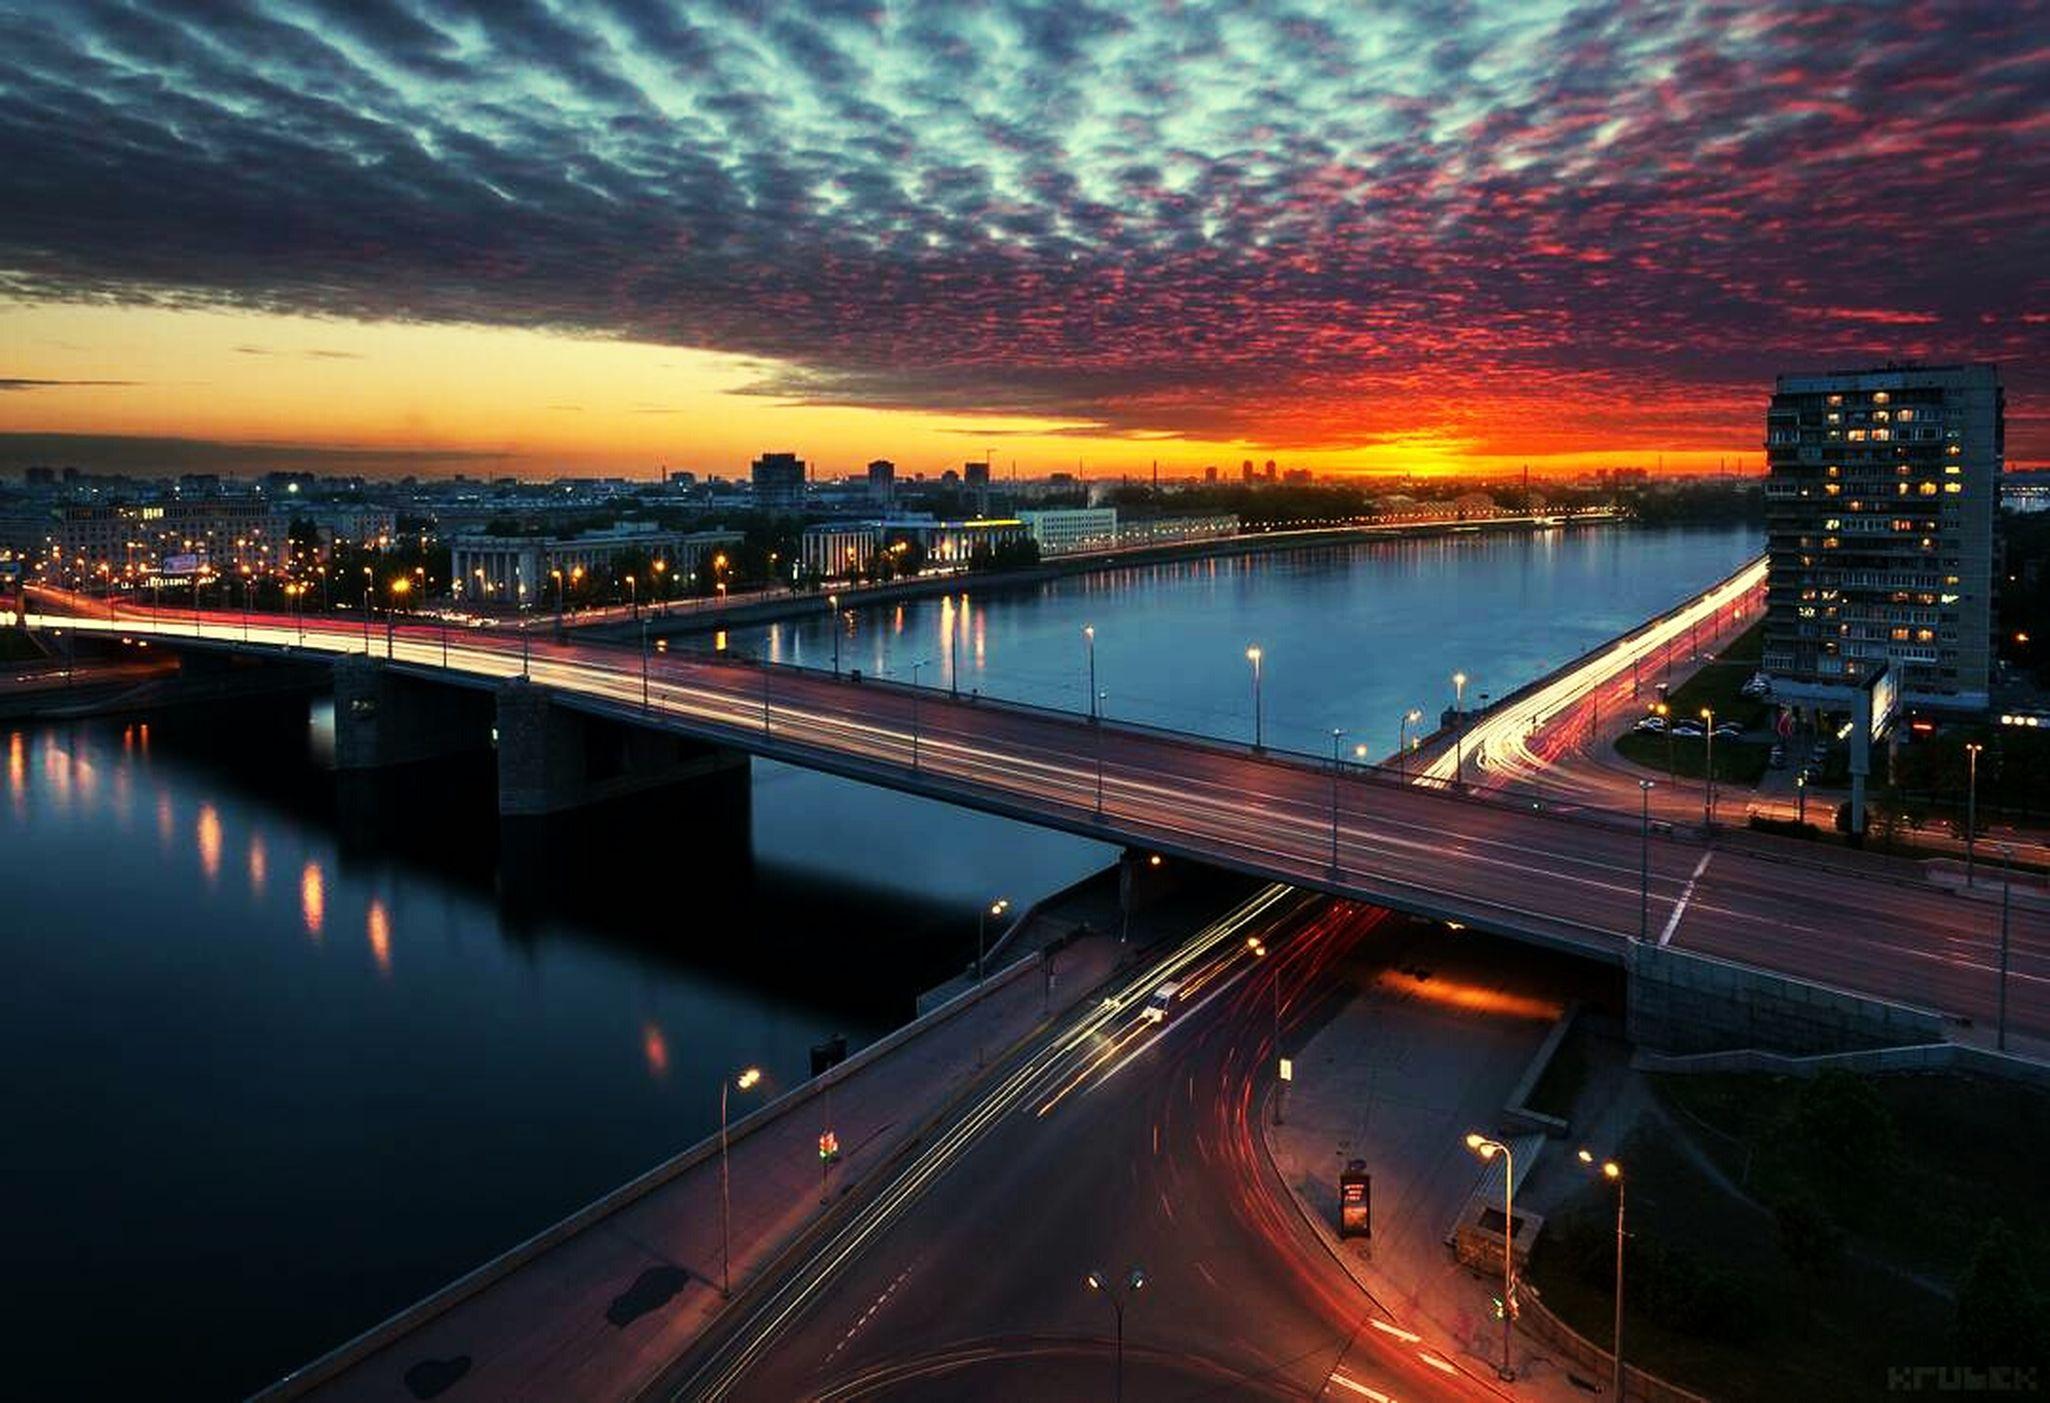 Relaxing I Love My City Sky Eyem Best Shot - My World Nightphotography Good Night Aqua закатсолнца Sky Of Sankt Peterburg Eyem Best Shot - Architecture